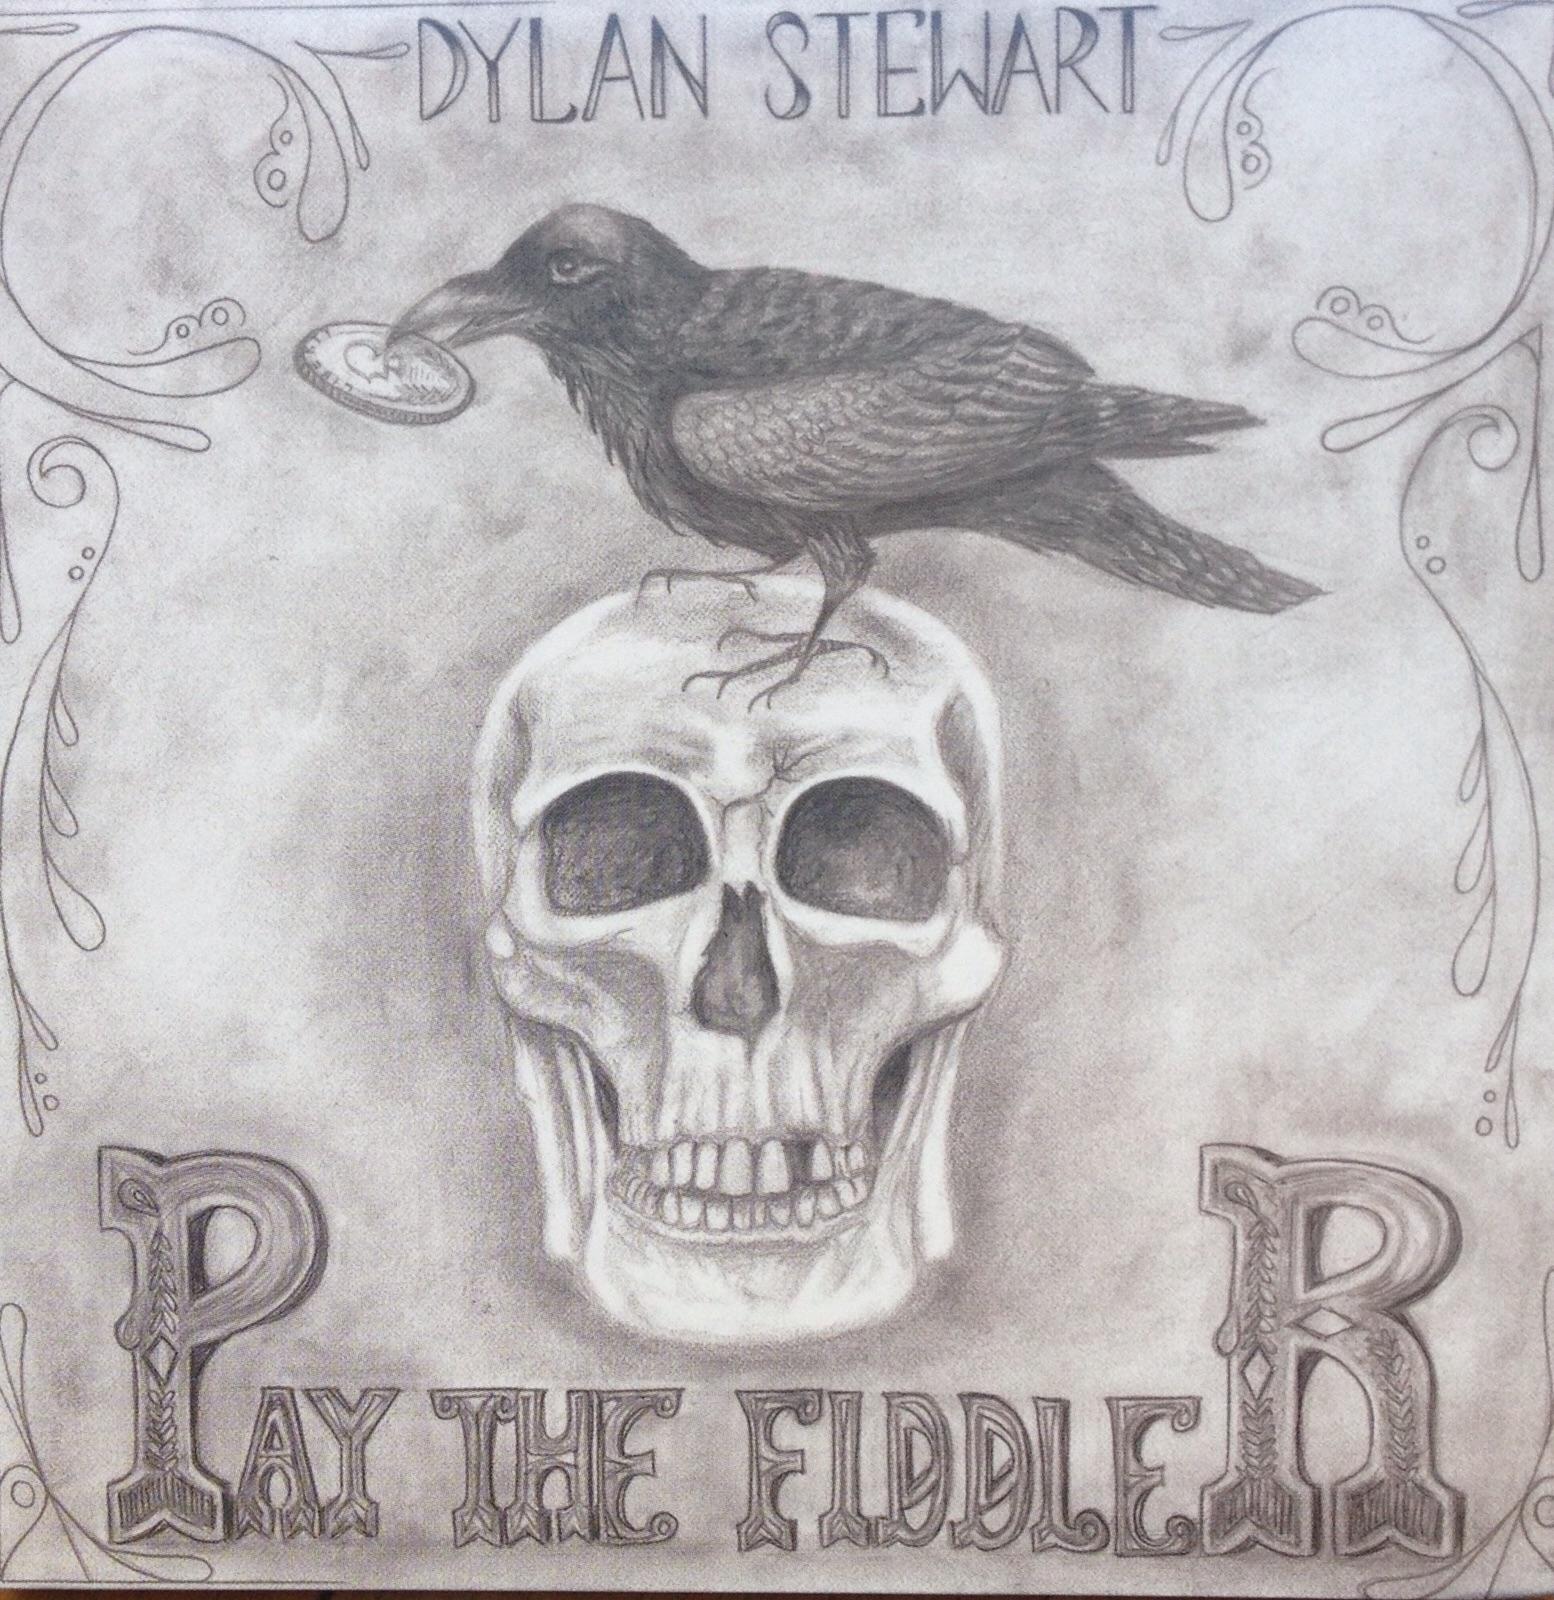 dylan-stewart-pay-the-fiddler.jpg